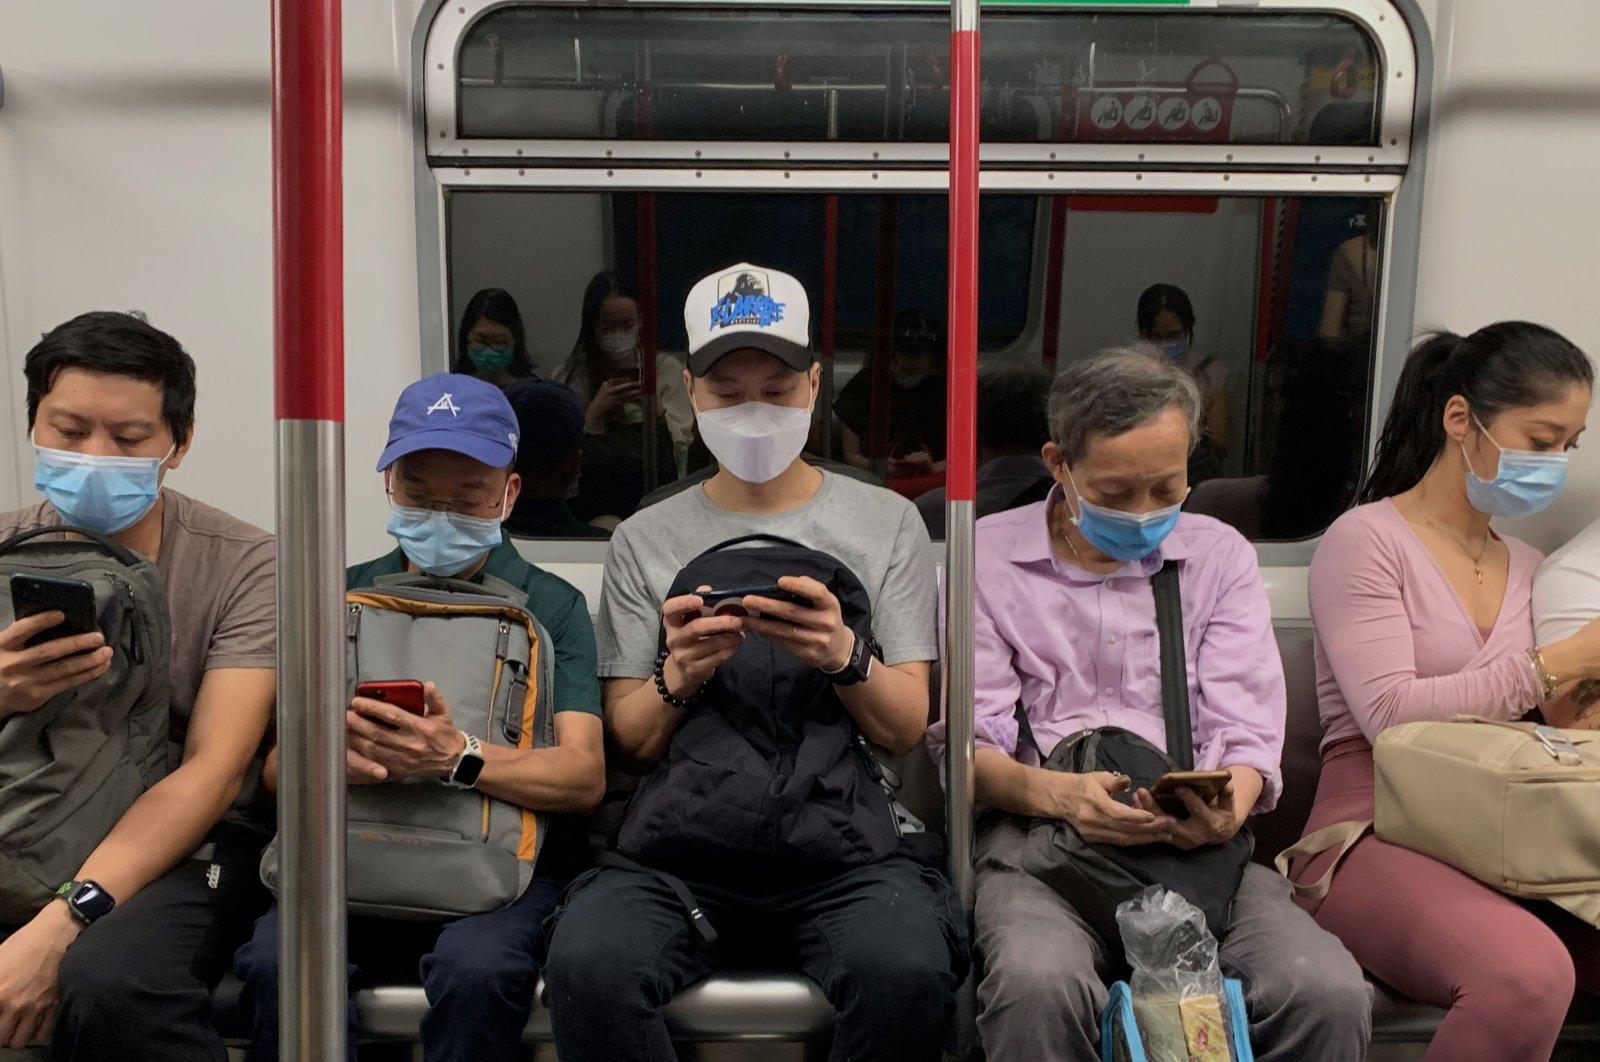 Passengers wear surgical masks in an MTR train, Hong Kong, July 13, 2020. (REUTERS Photo)